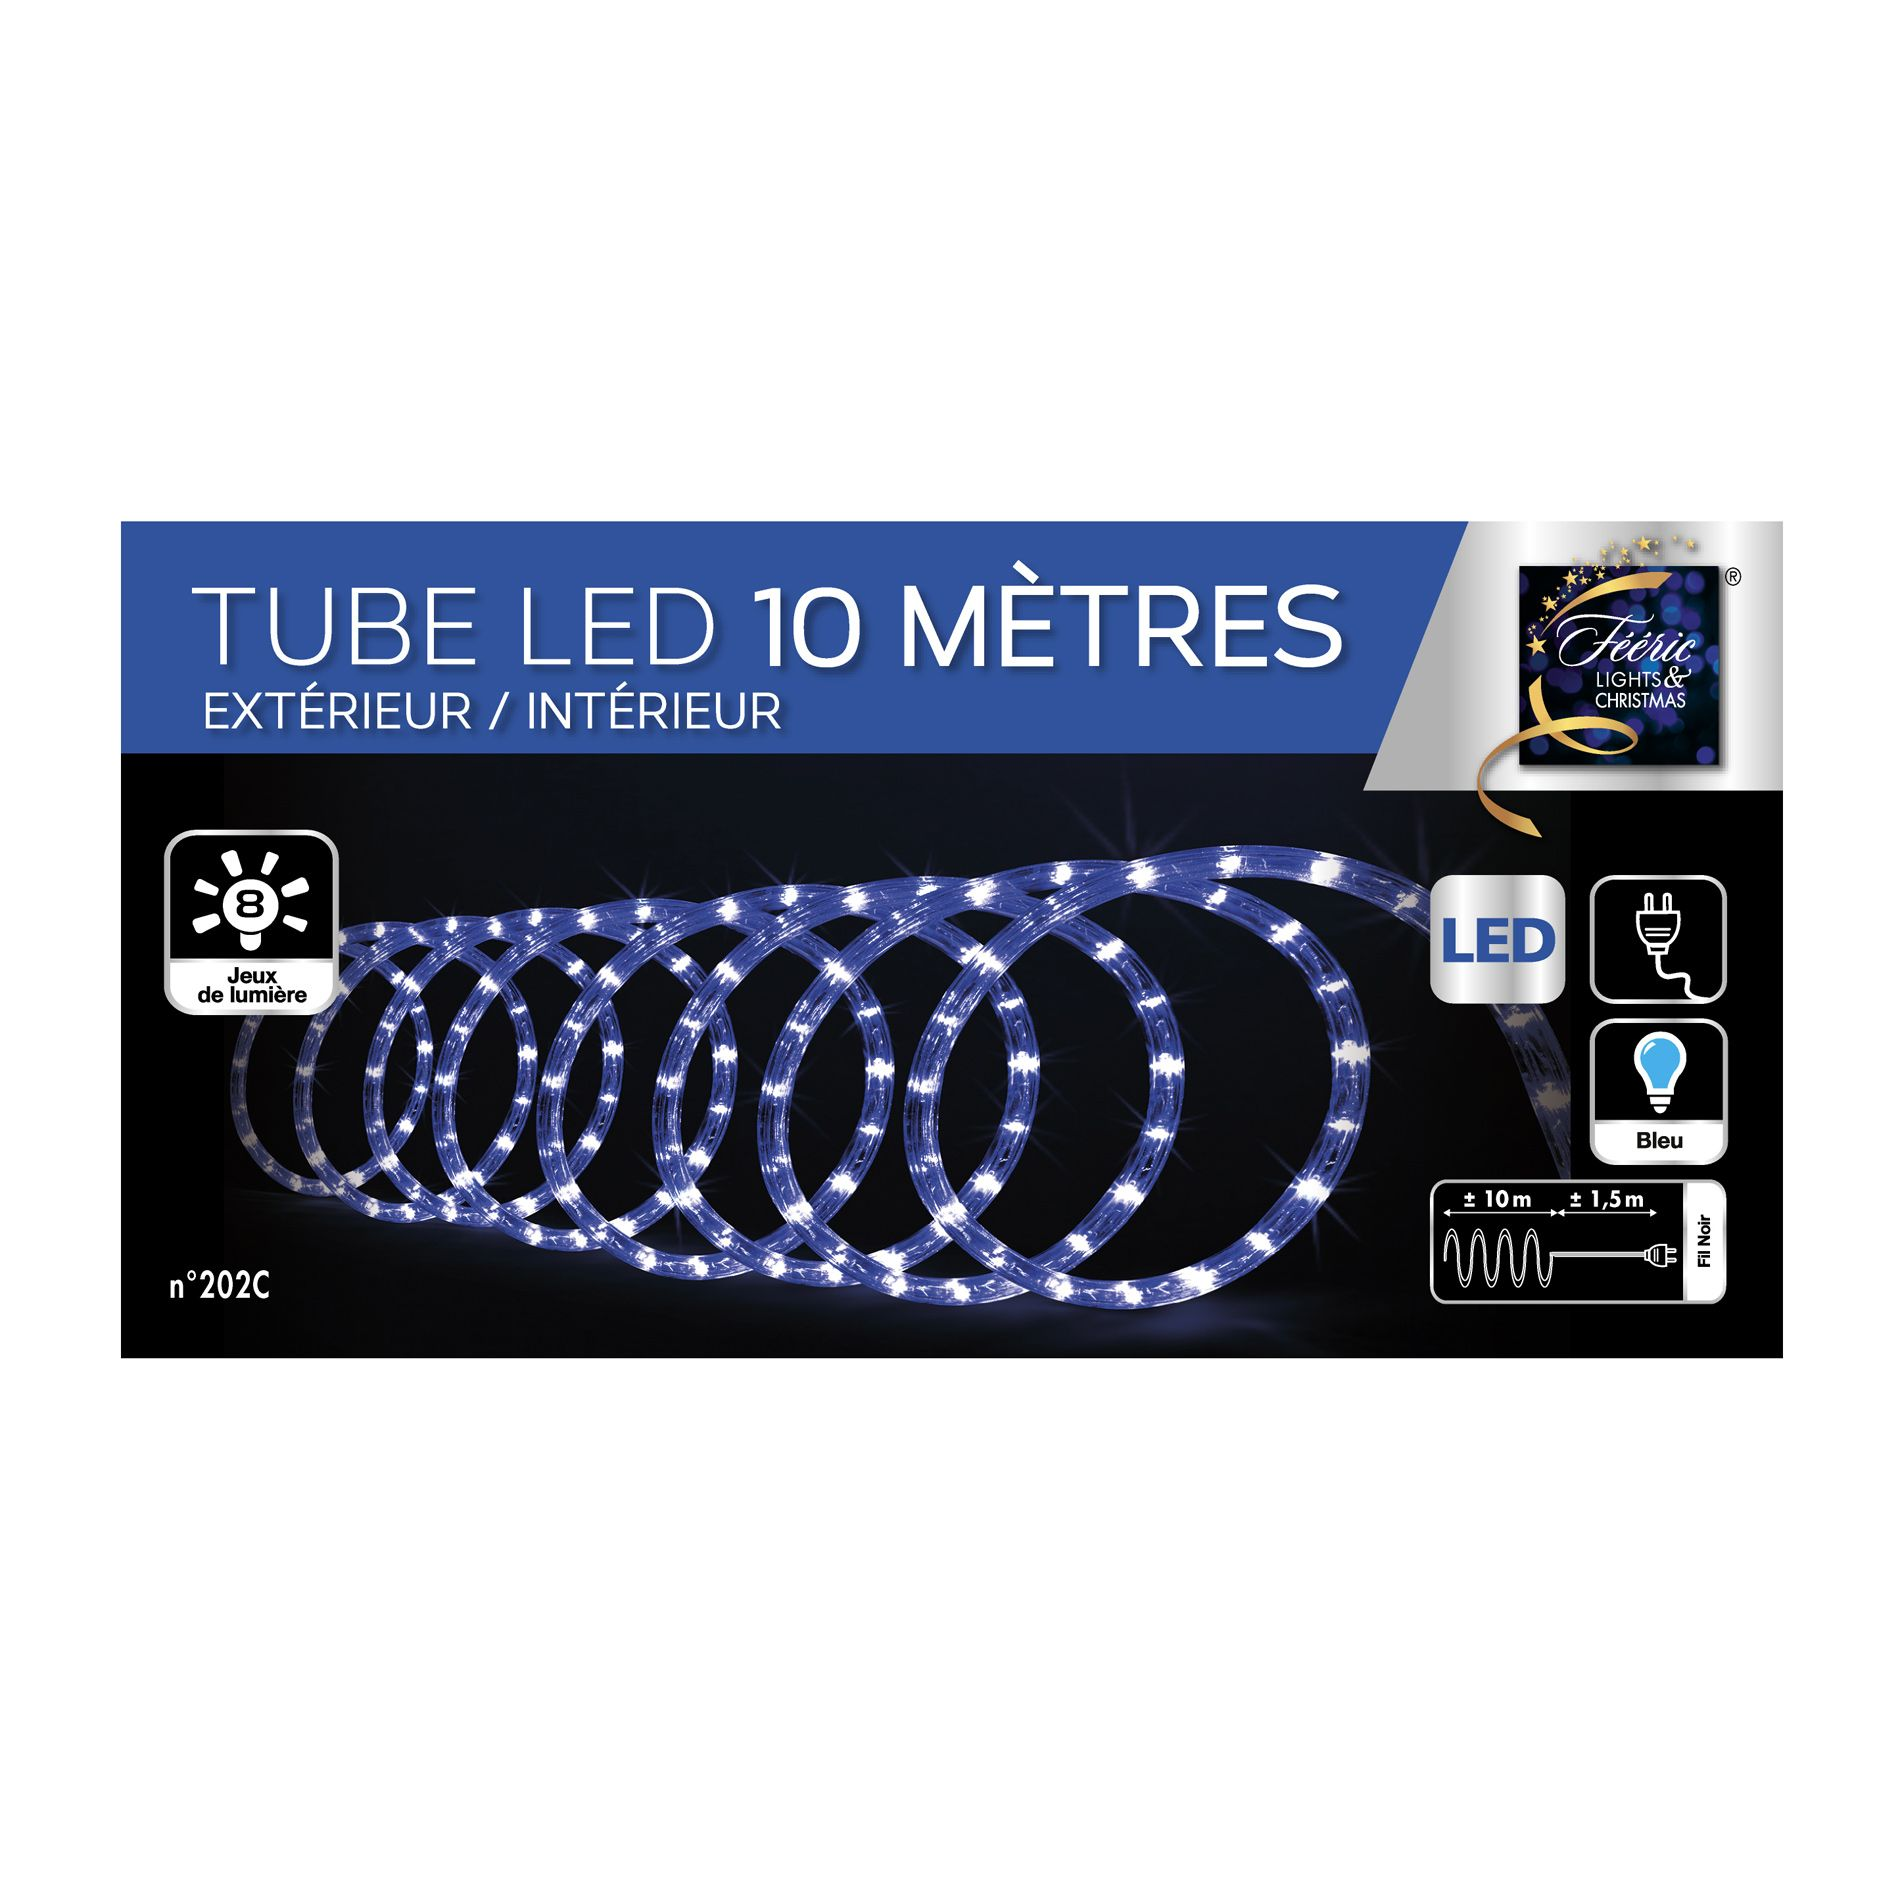 tube lumineux 10 m bleu 180 led guirlande lumineuse eminza. Black Bedroom Furniture Sets. Home Design Ideas